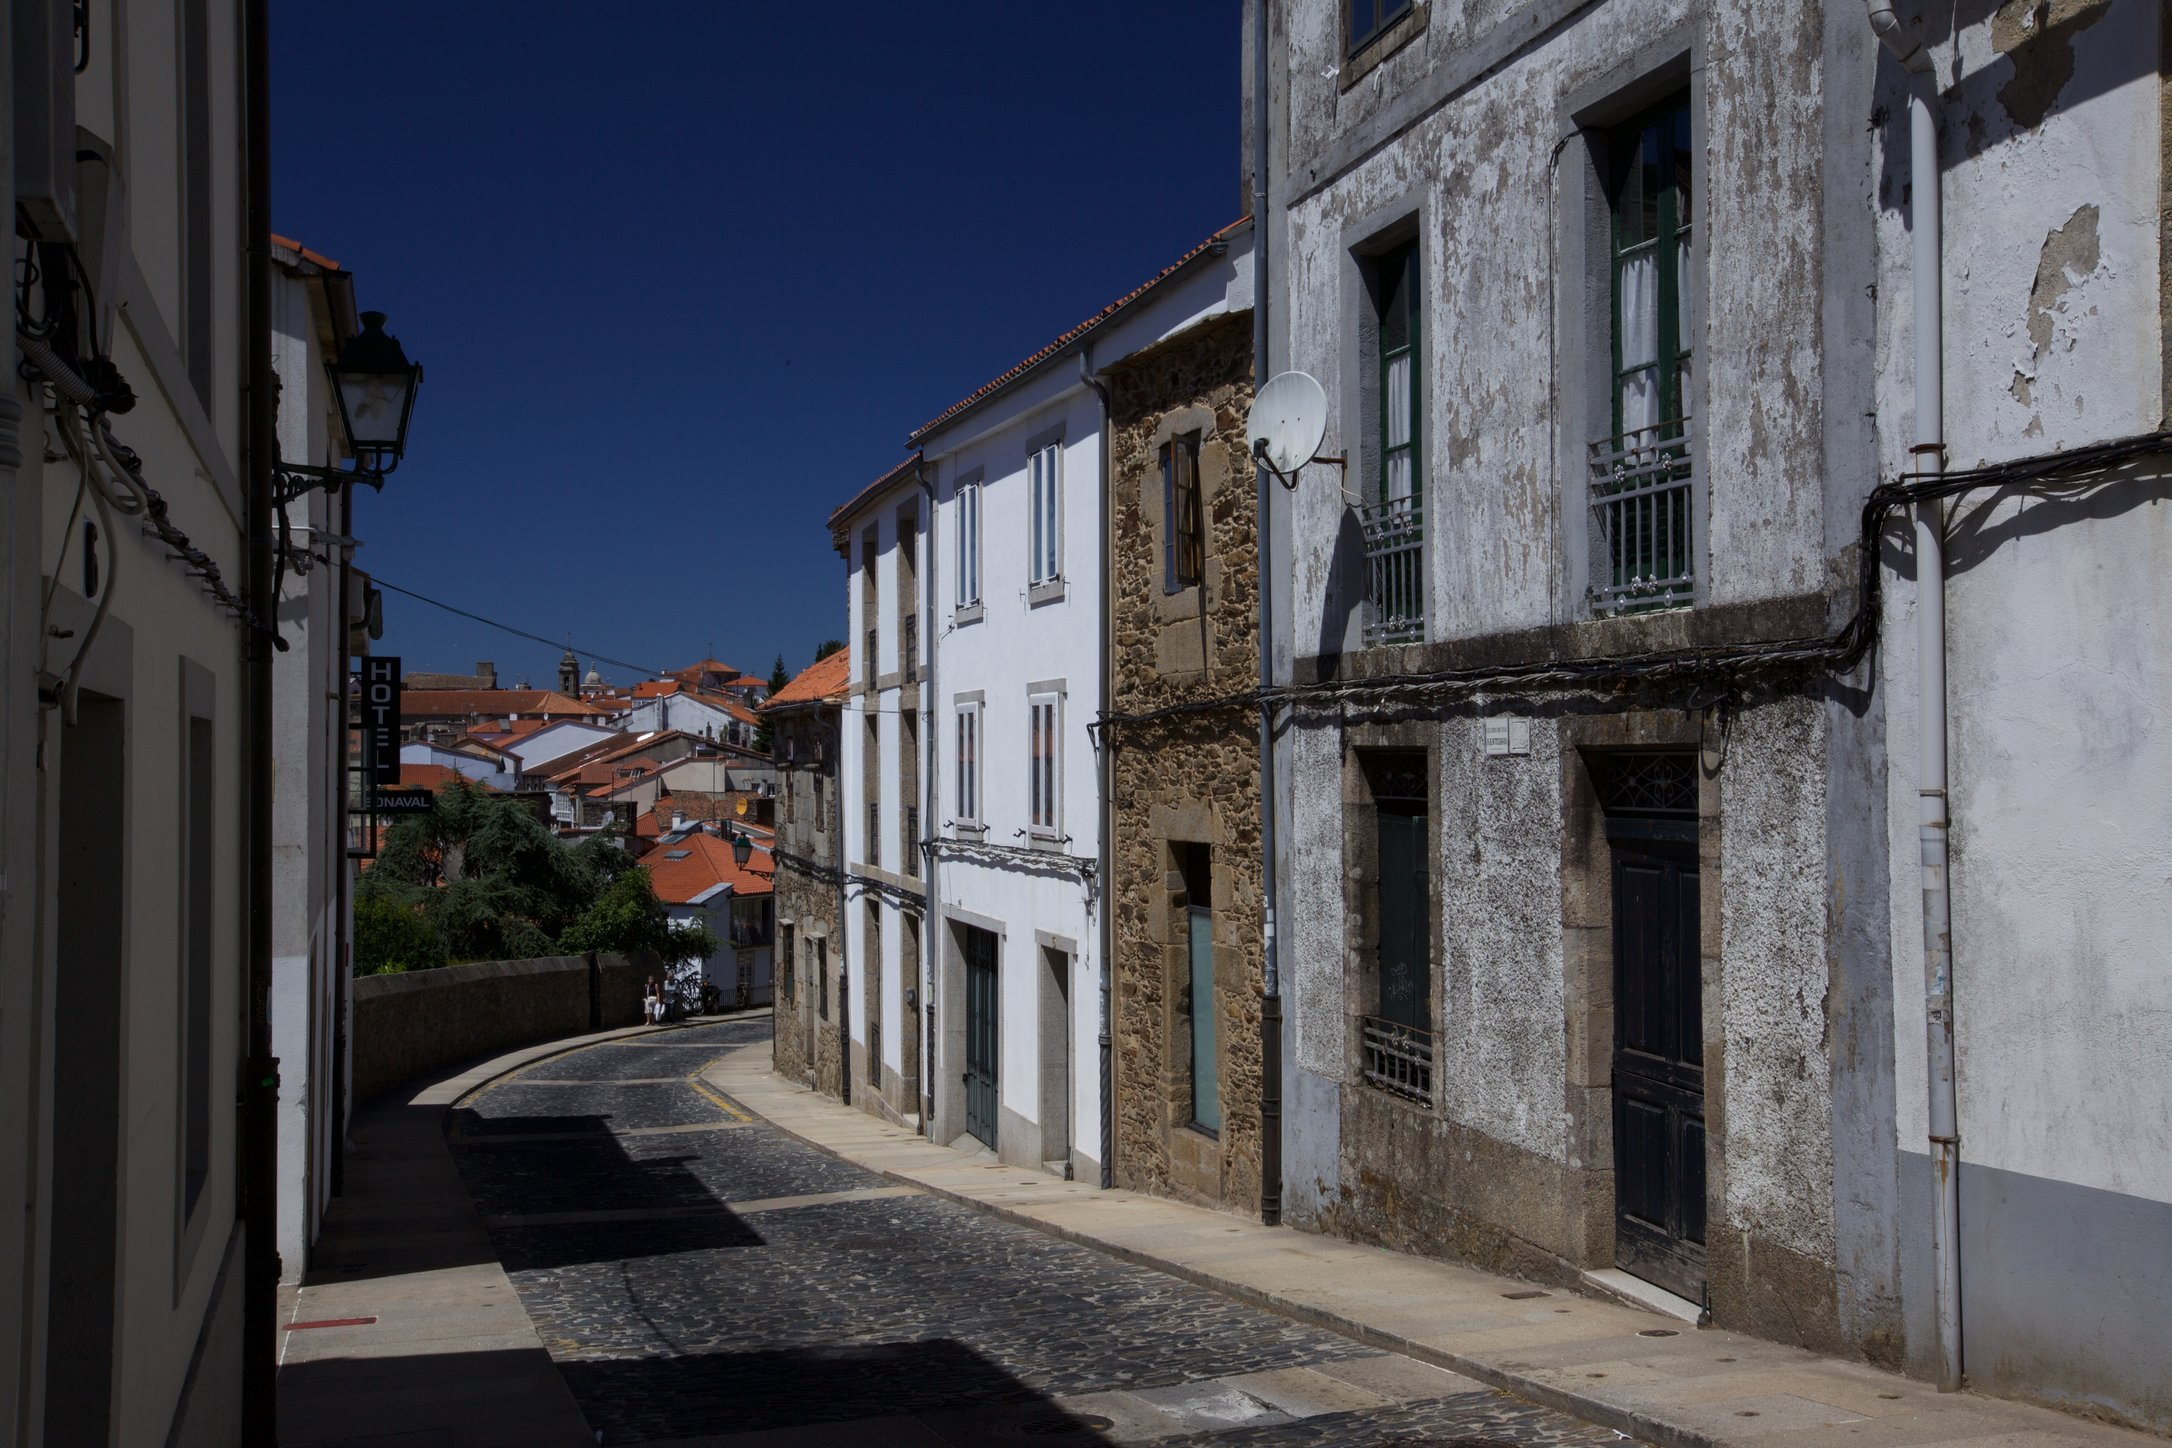 Galicia_008.jpg